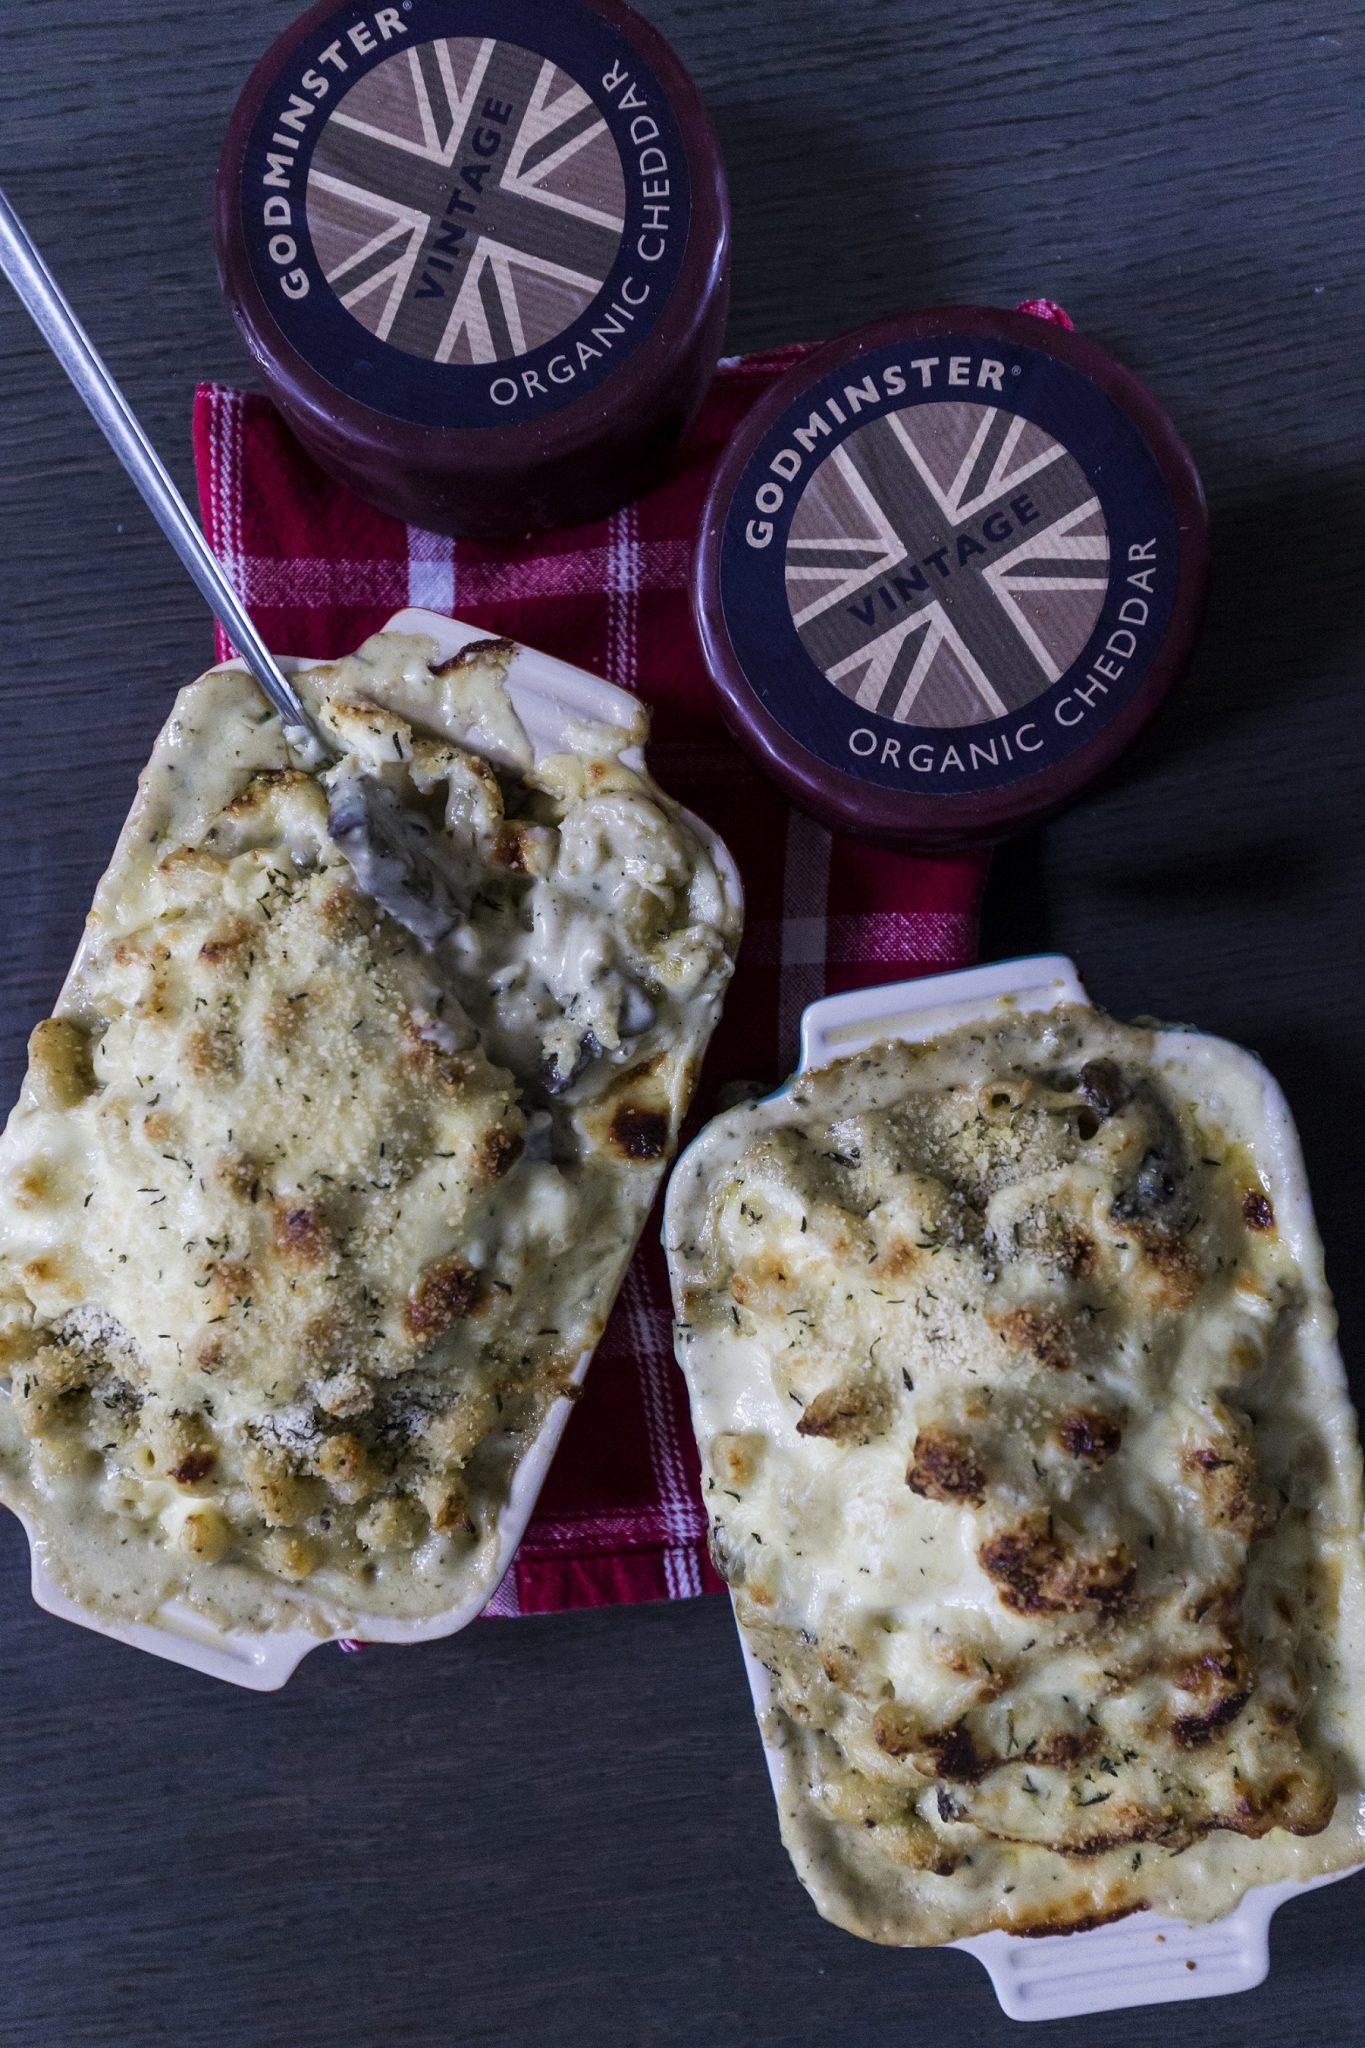 Godminster Truffled Mushroom Mac and Cheese